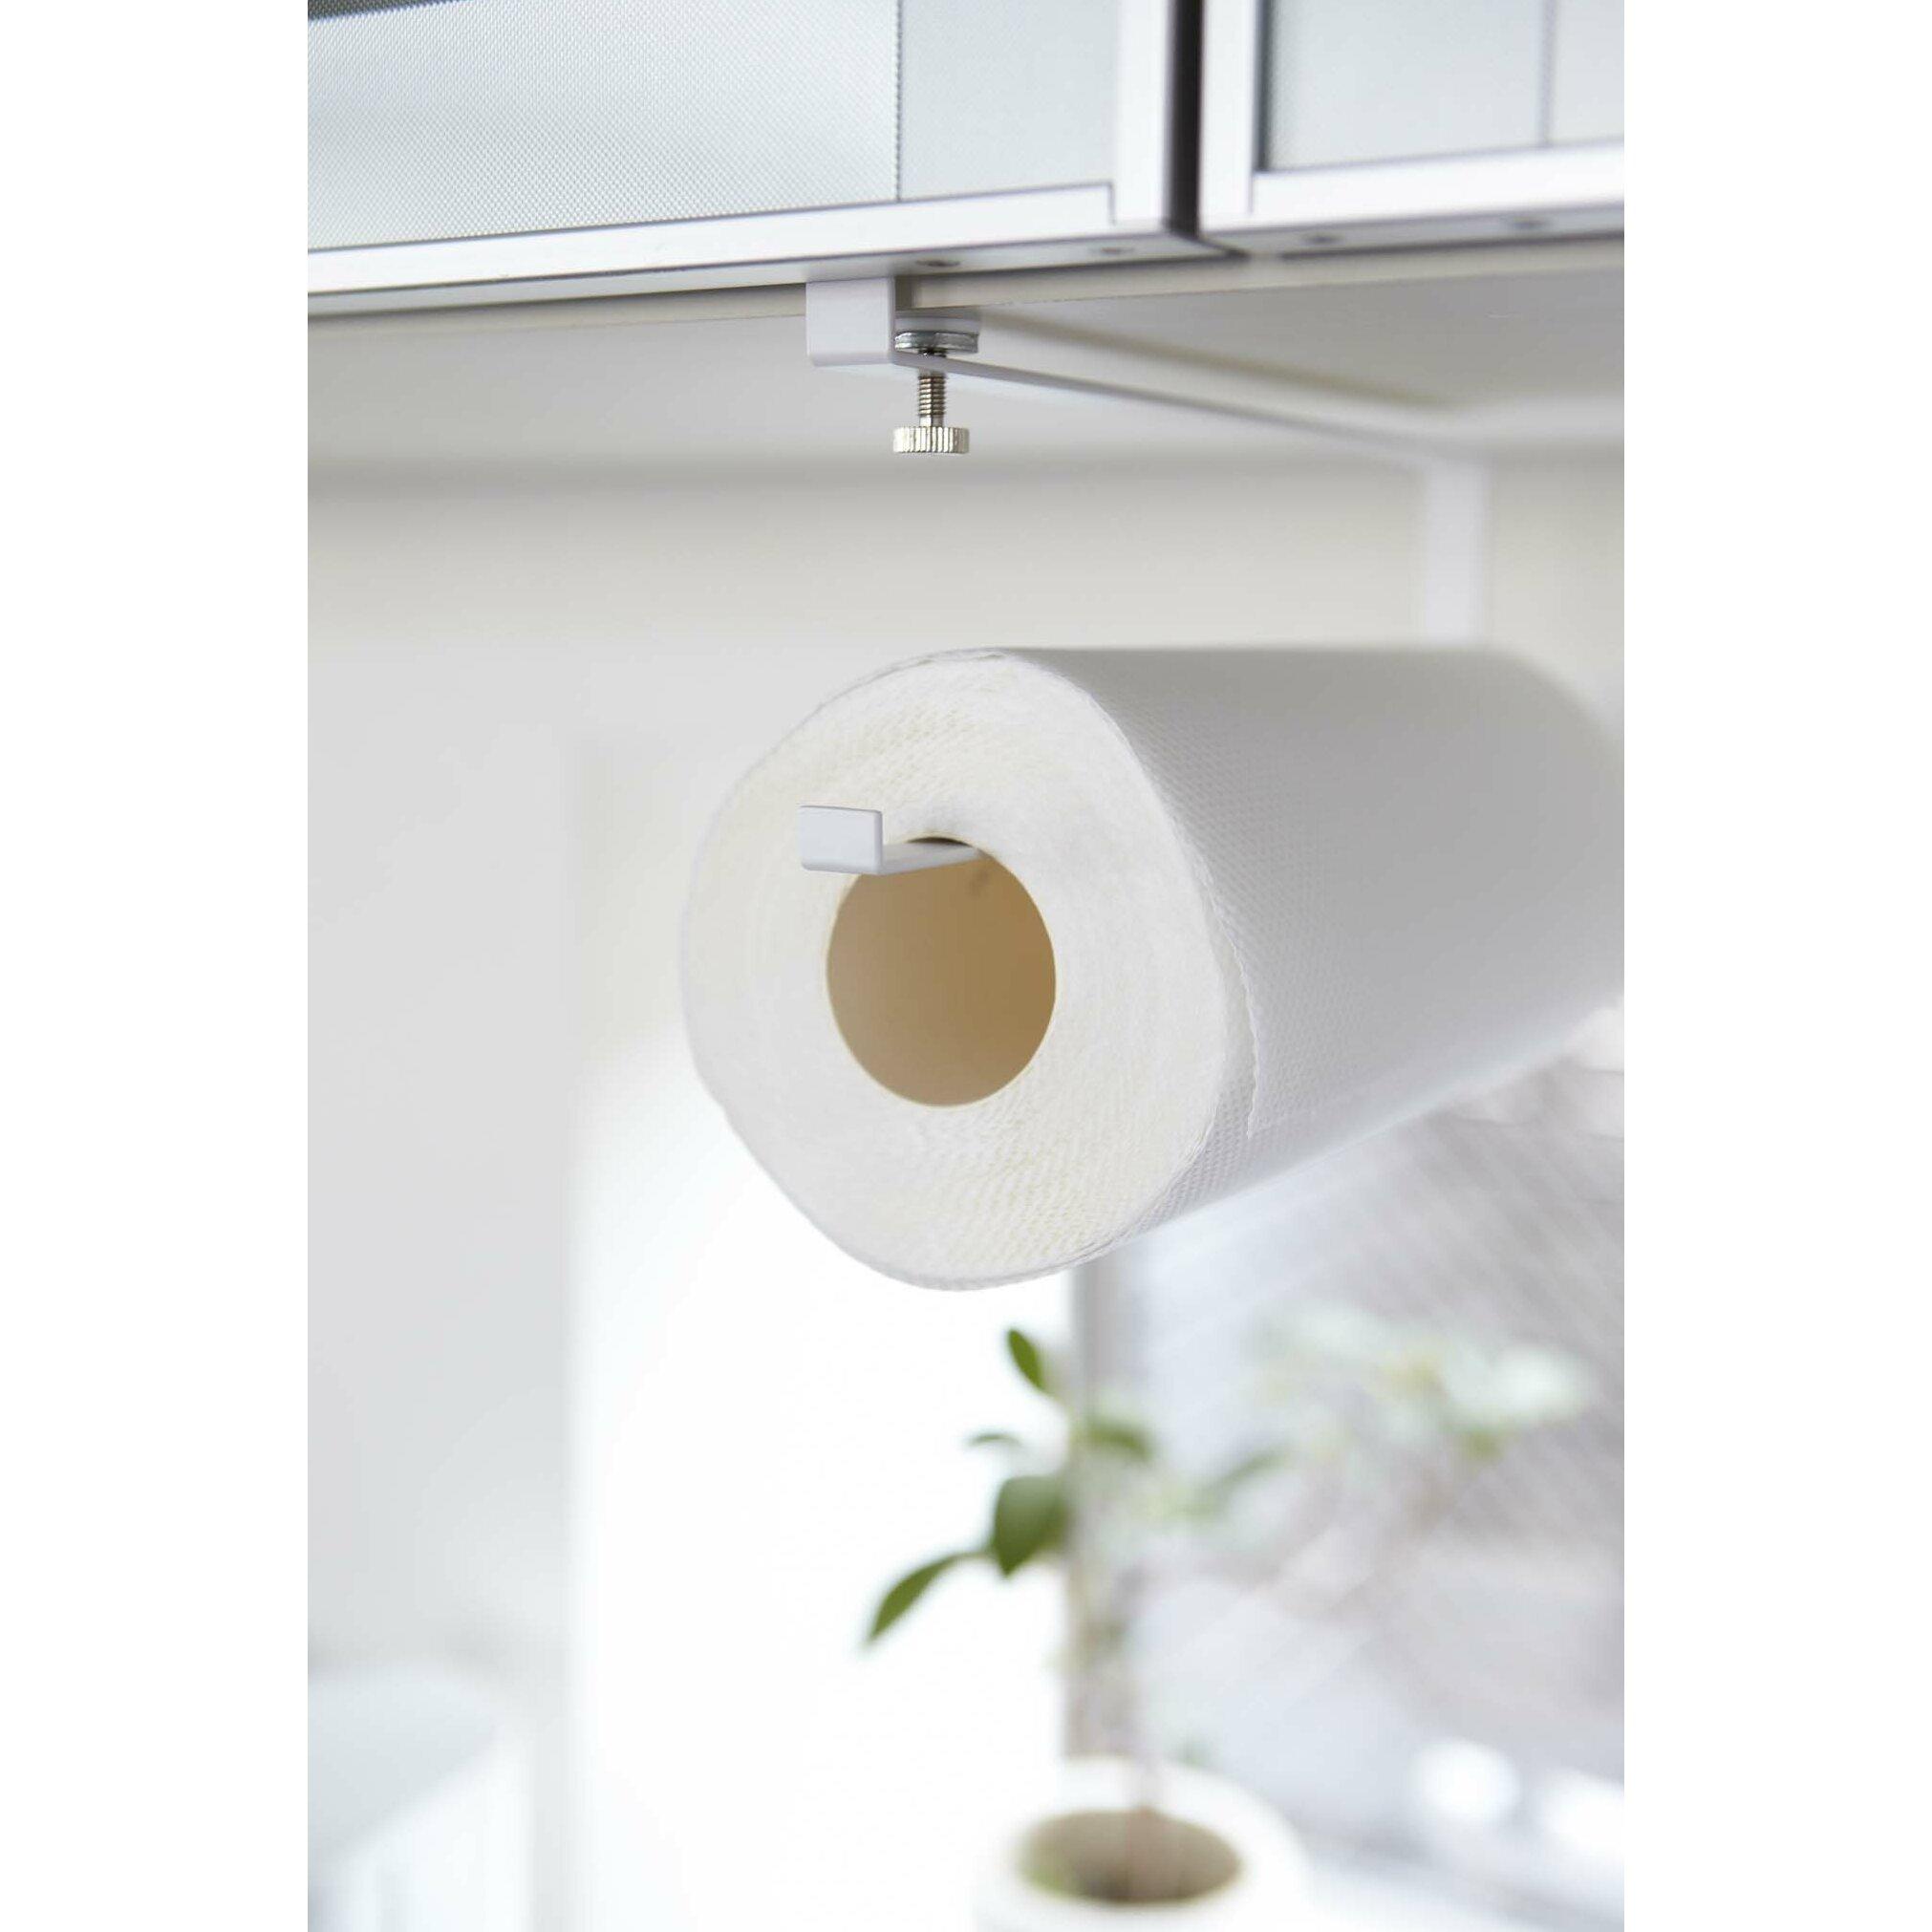 Yamazaki usa plate under shelf paper towel holder wayfair